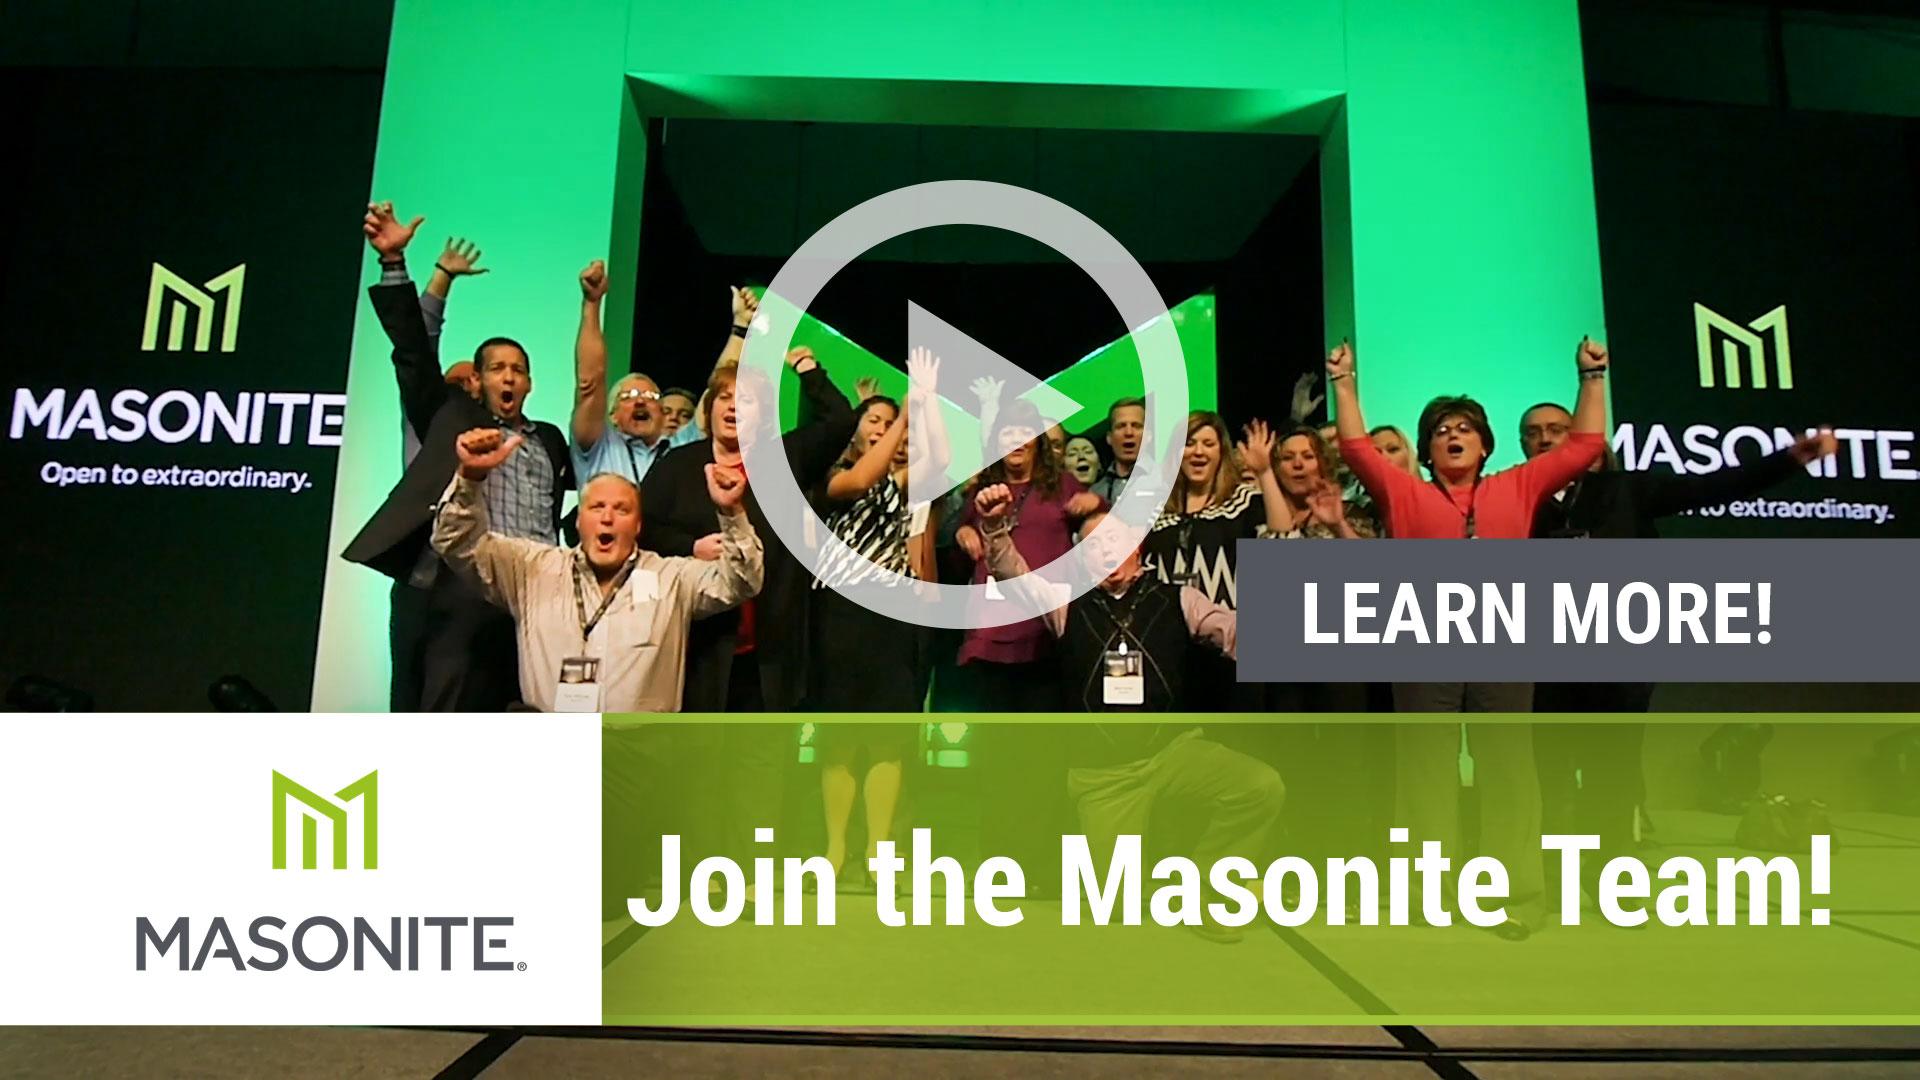 Masonite Team Video